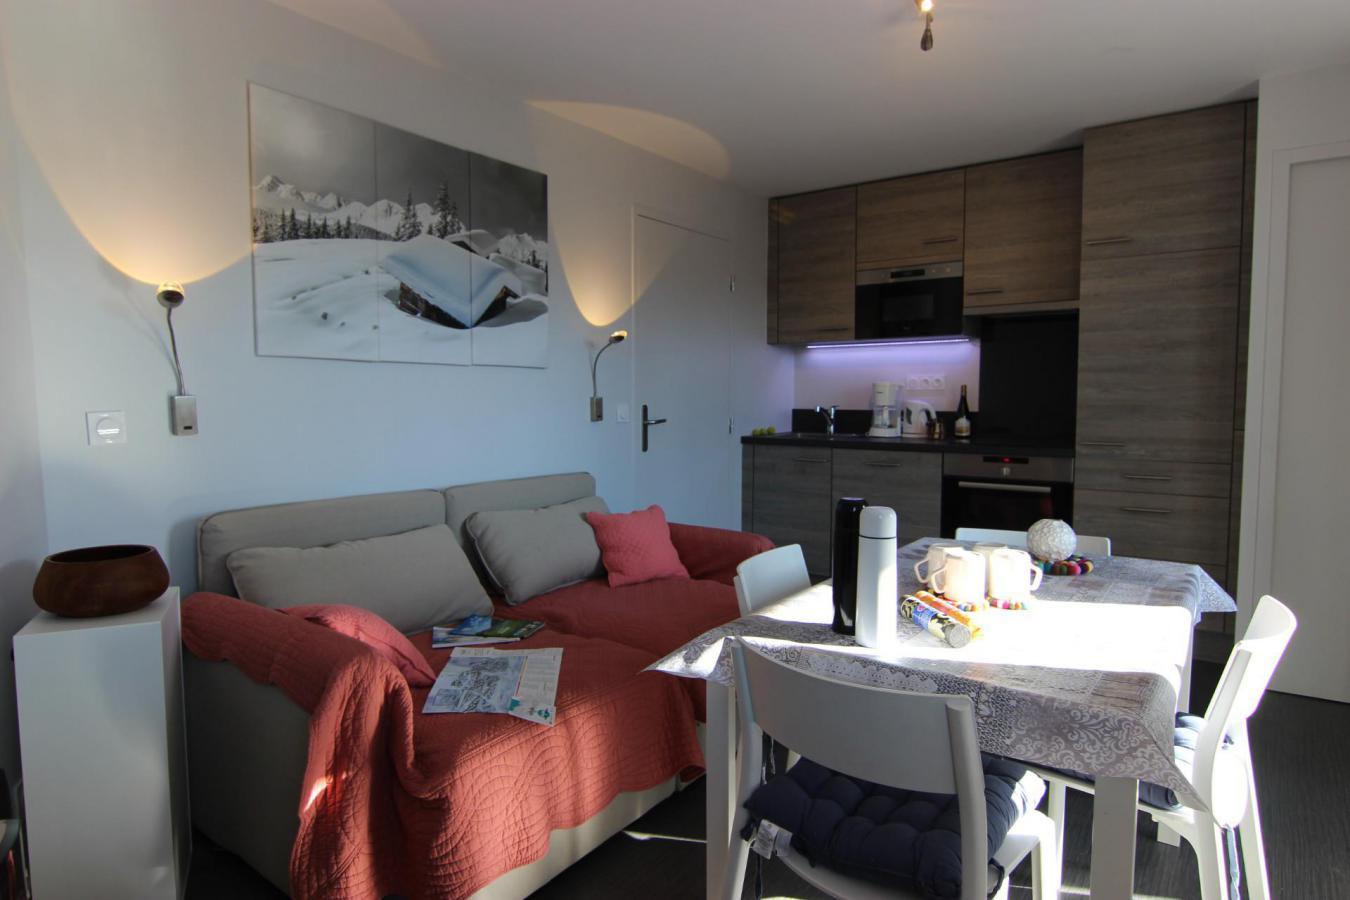 Location au ski Appartement 2 pièces 4 personnes (52) - Residence Reine Blanche - Val Thorens - Fauteuil